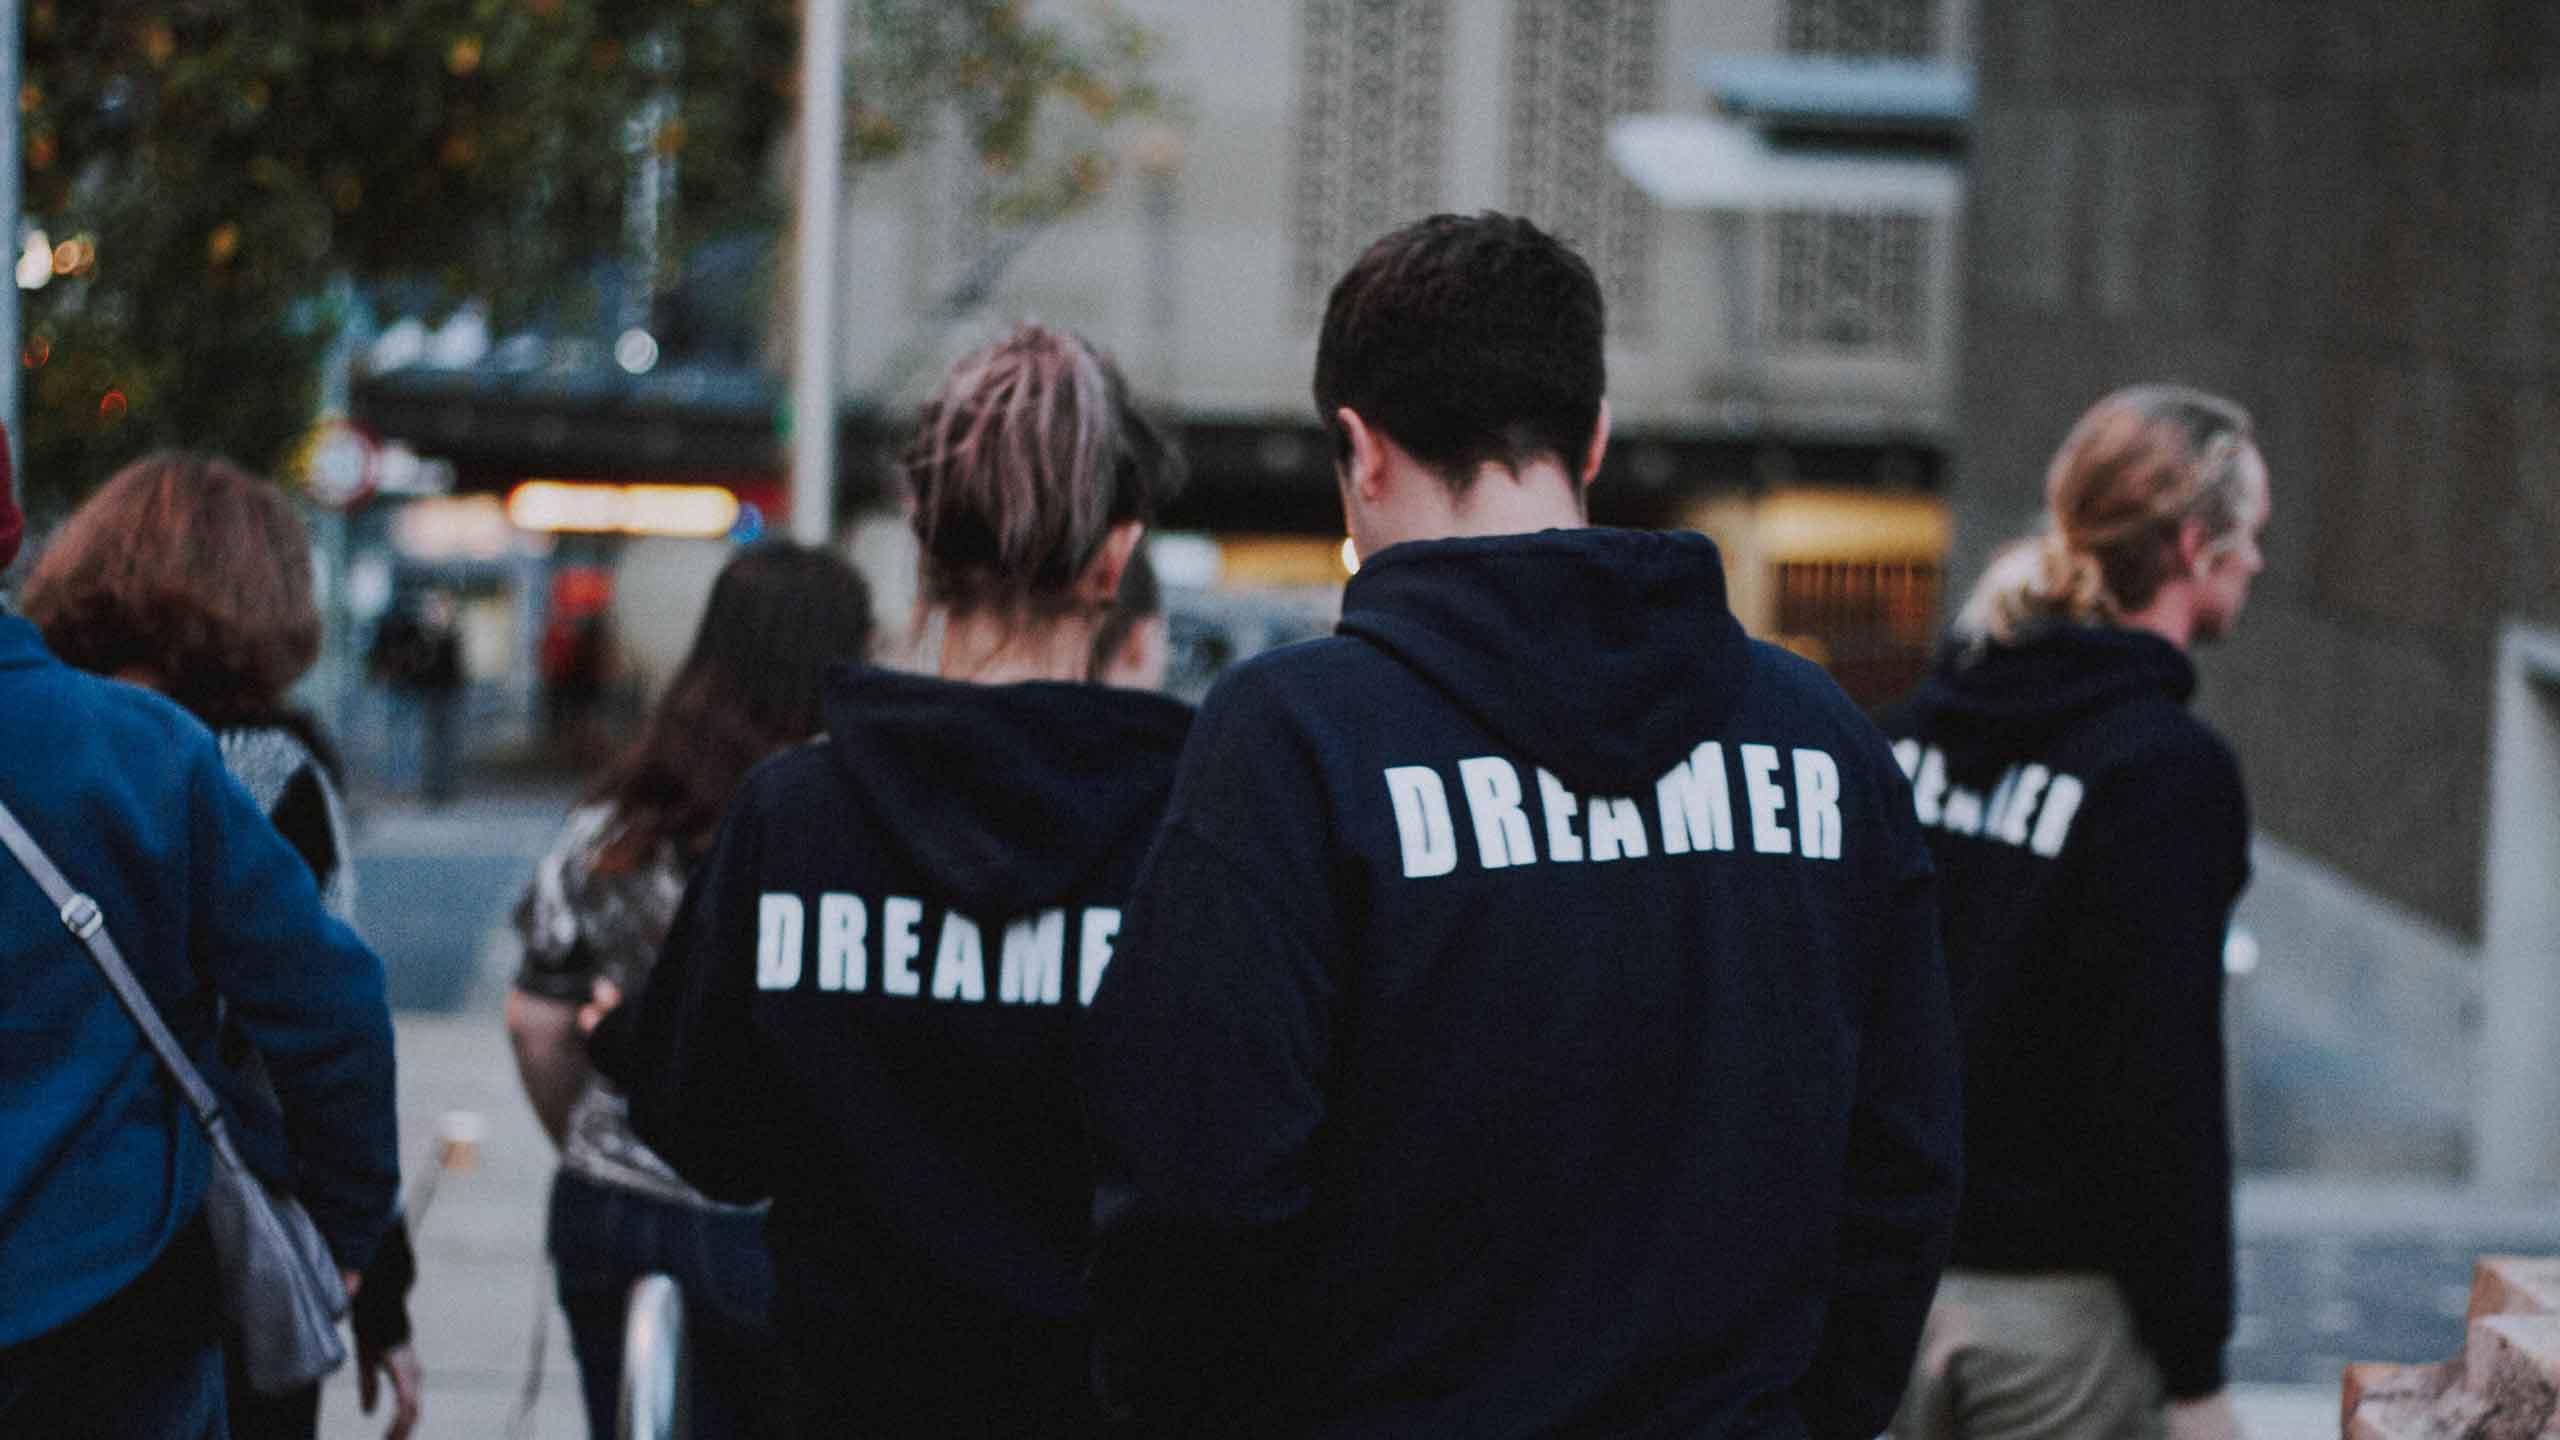 Dream Centre staff in Auckland